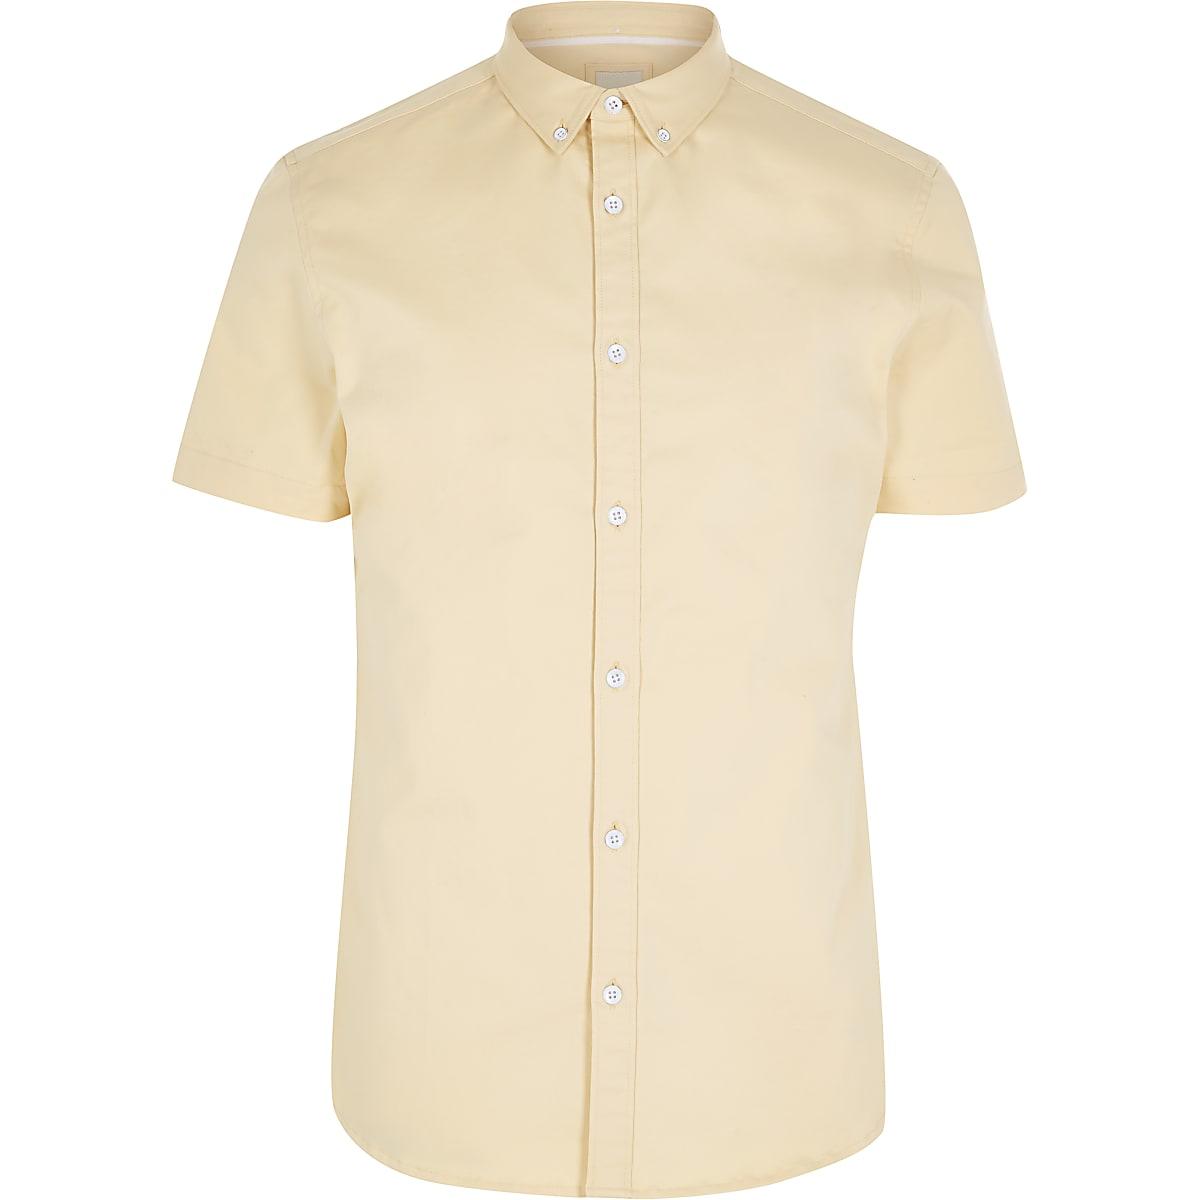 Yellow short sleeve twill shirt